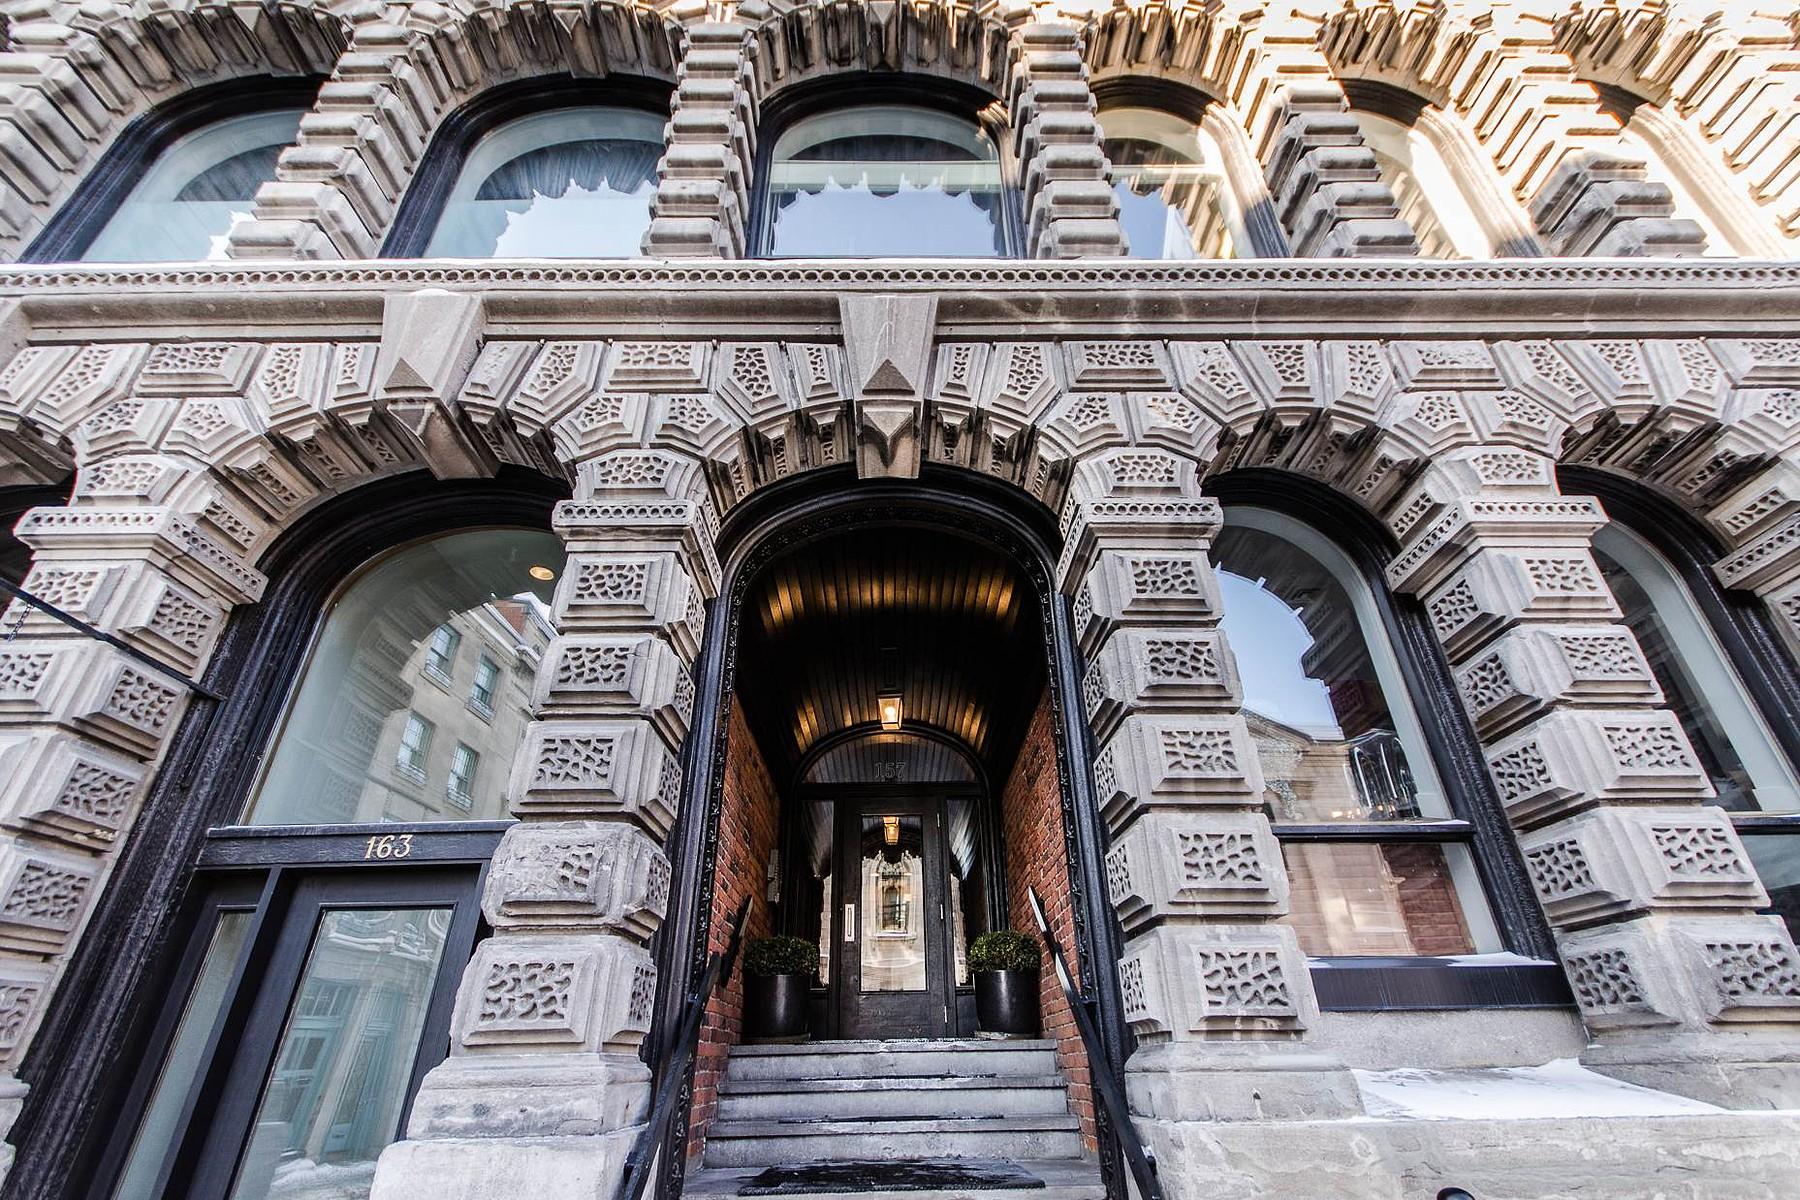 Tek Ailelik Ev için Satış at Ville-Marie (Montréal), Montréal 157 Rue St-Paul O., Apt. 39 Montreal, Quebec H2Y1Z5 Kanada